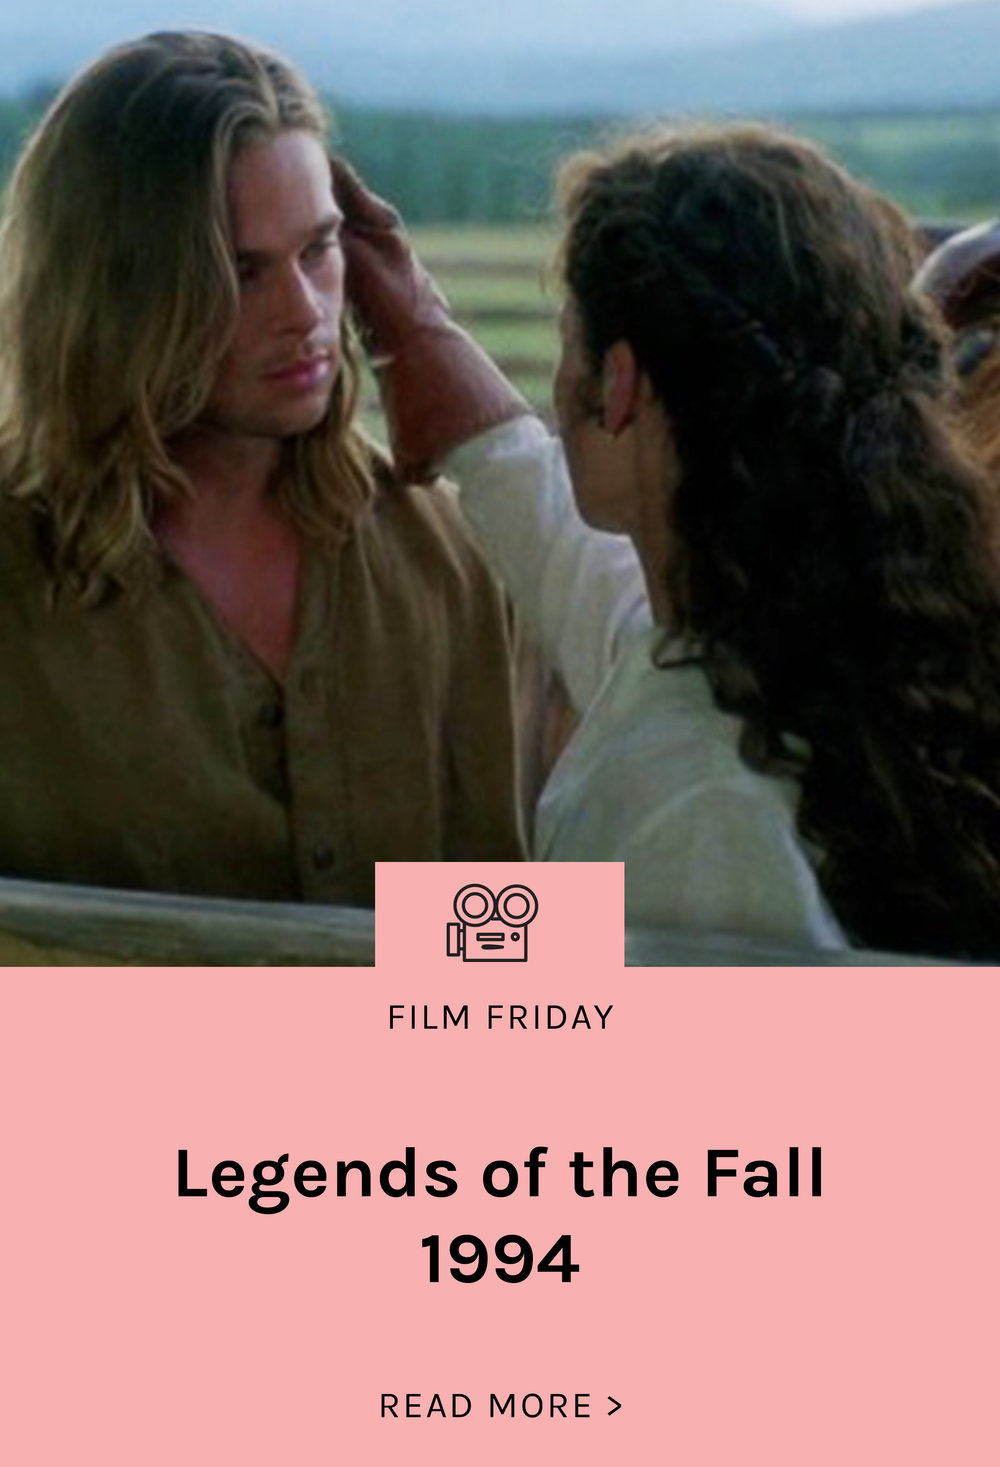 Lisa-Says-Gah-Film-Friday-Legends-of-the-Fall-BlogLanding.jpg